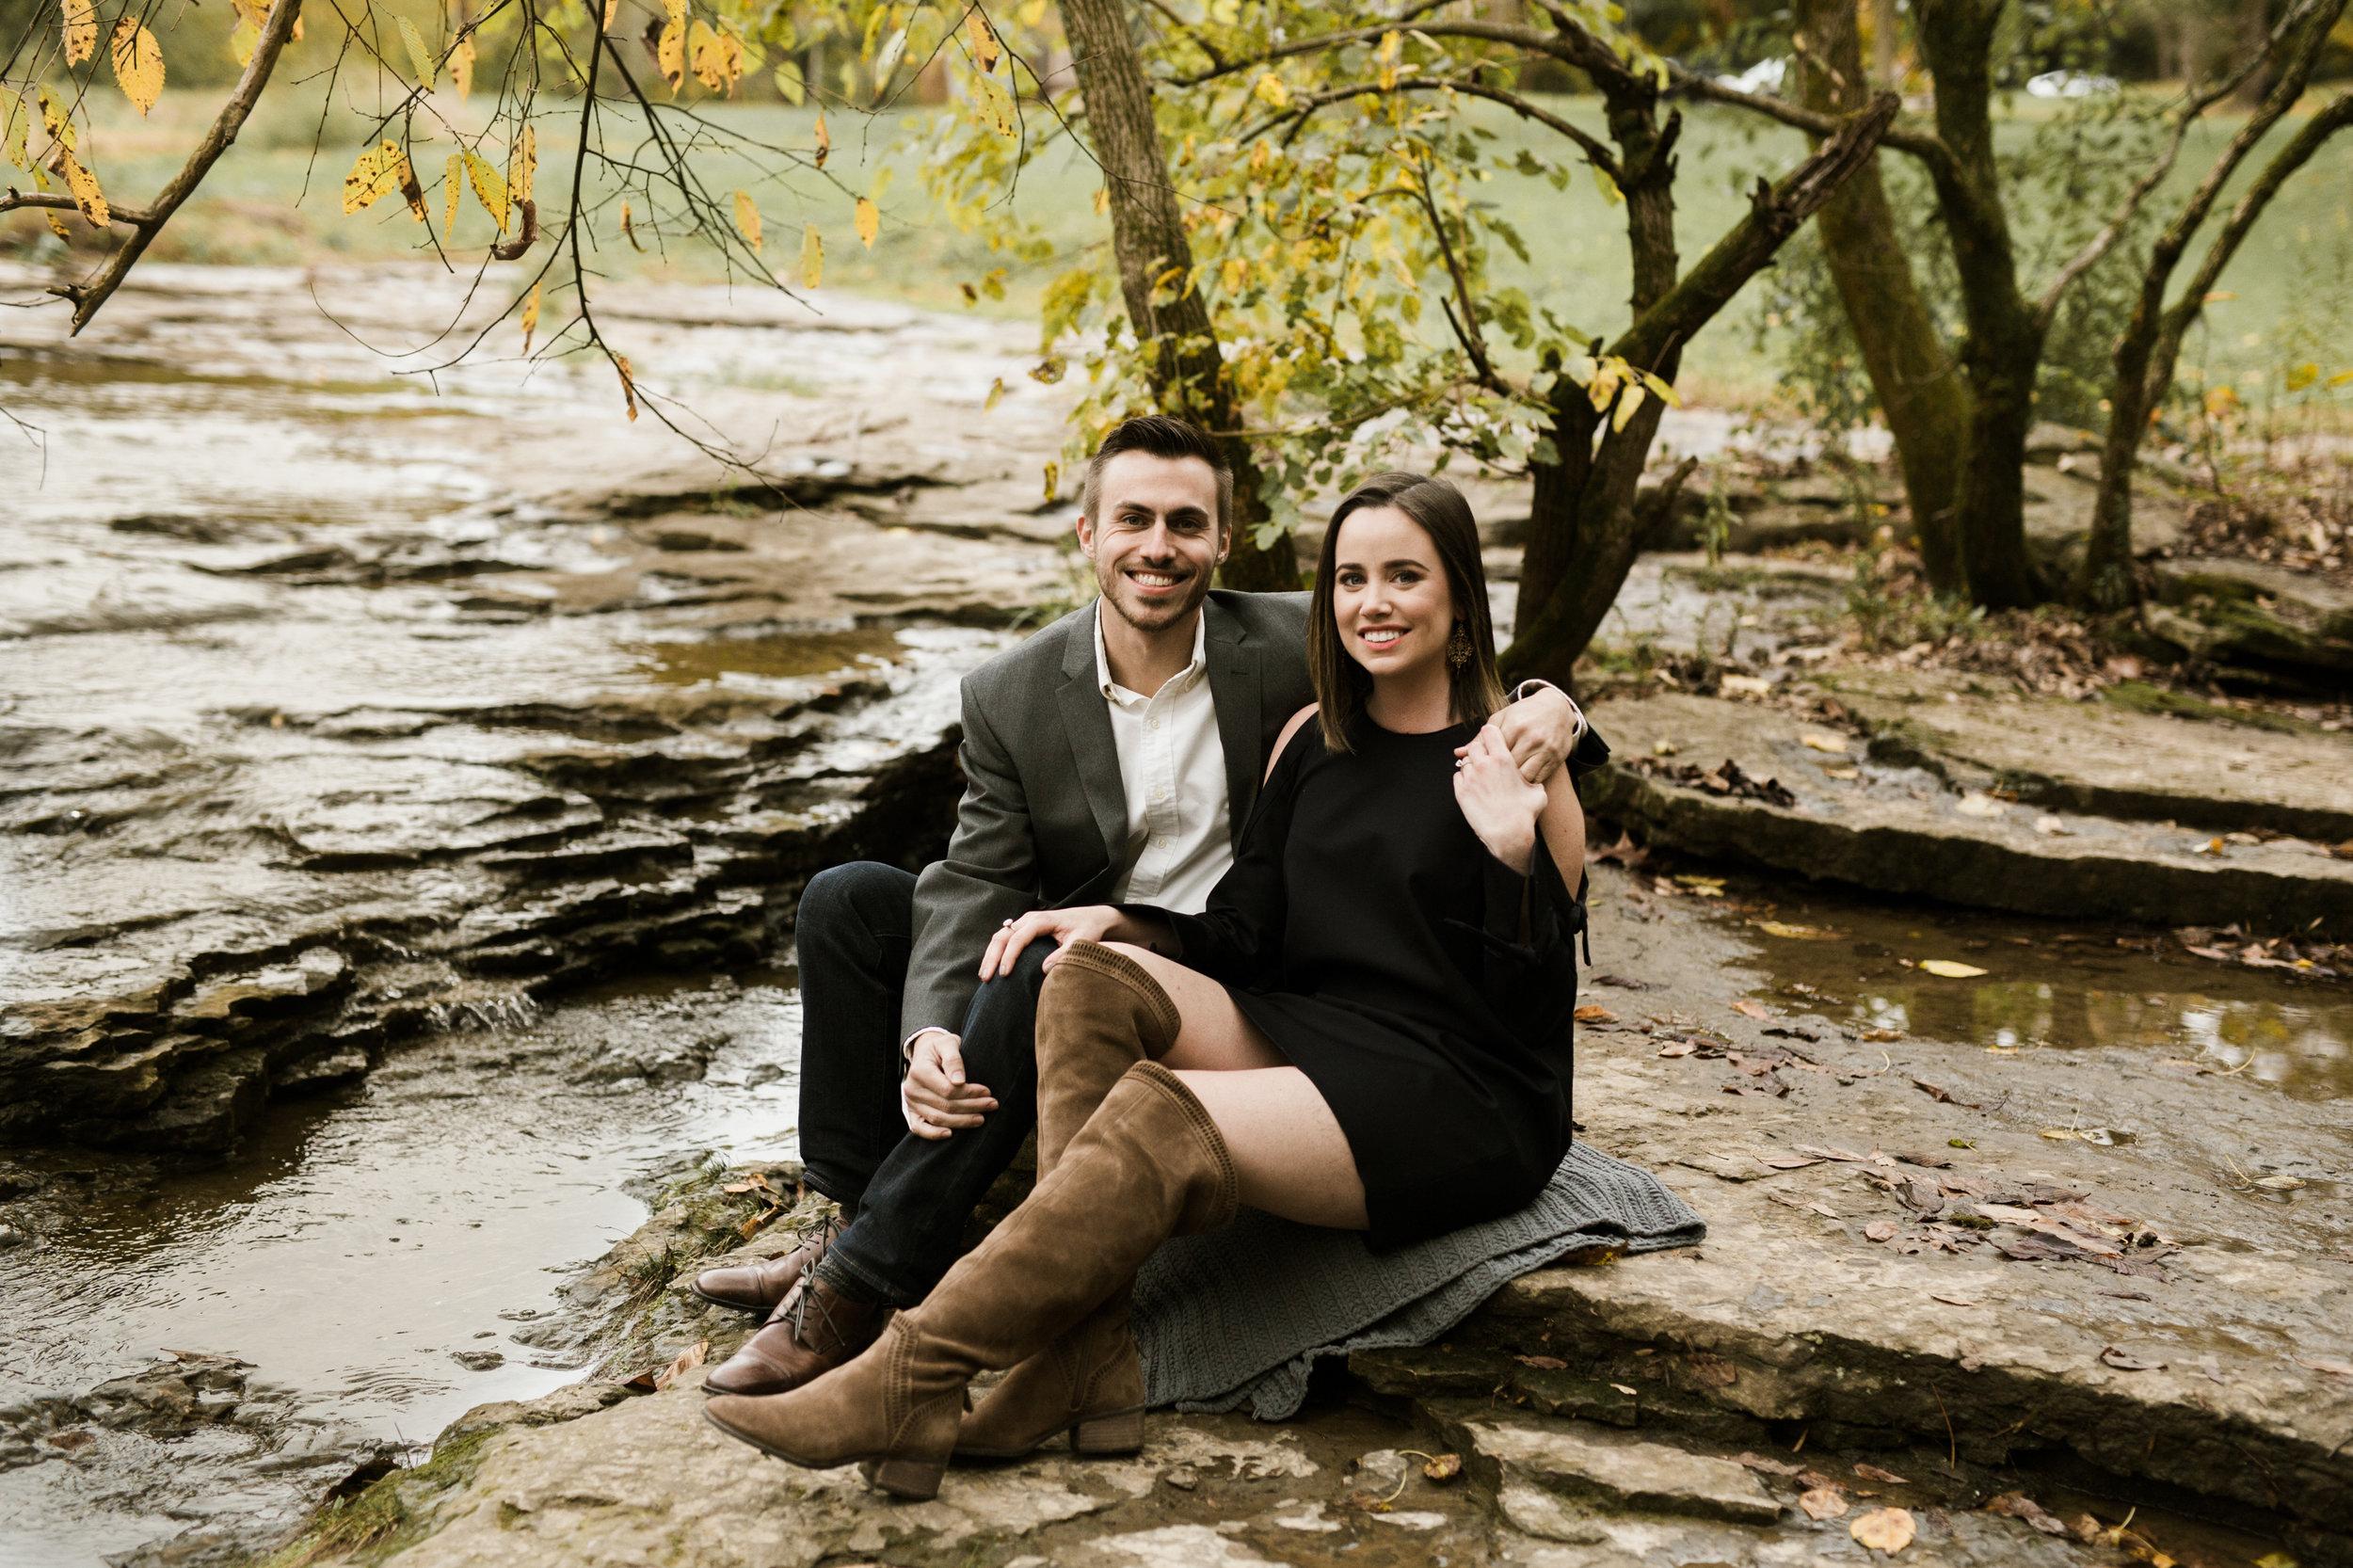 Kelsey and Daniel Engagement 2018 Crystal Ludwick Photo Louisville Wedding Photographer Kentucky Wedding Photographer (27 of 31).jpg